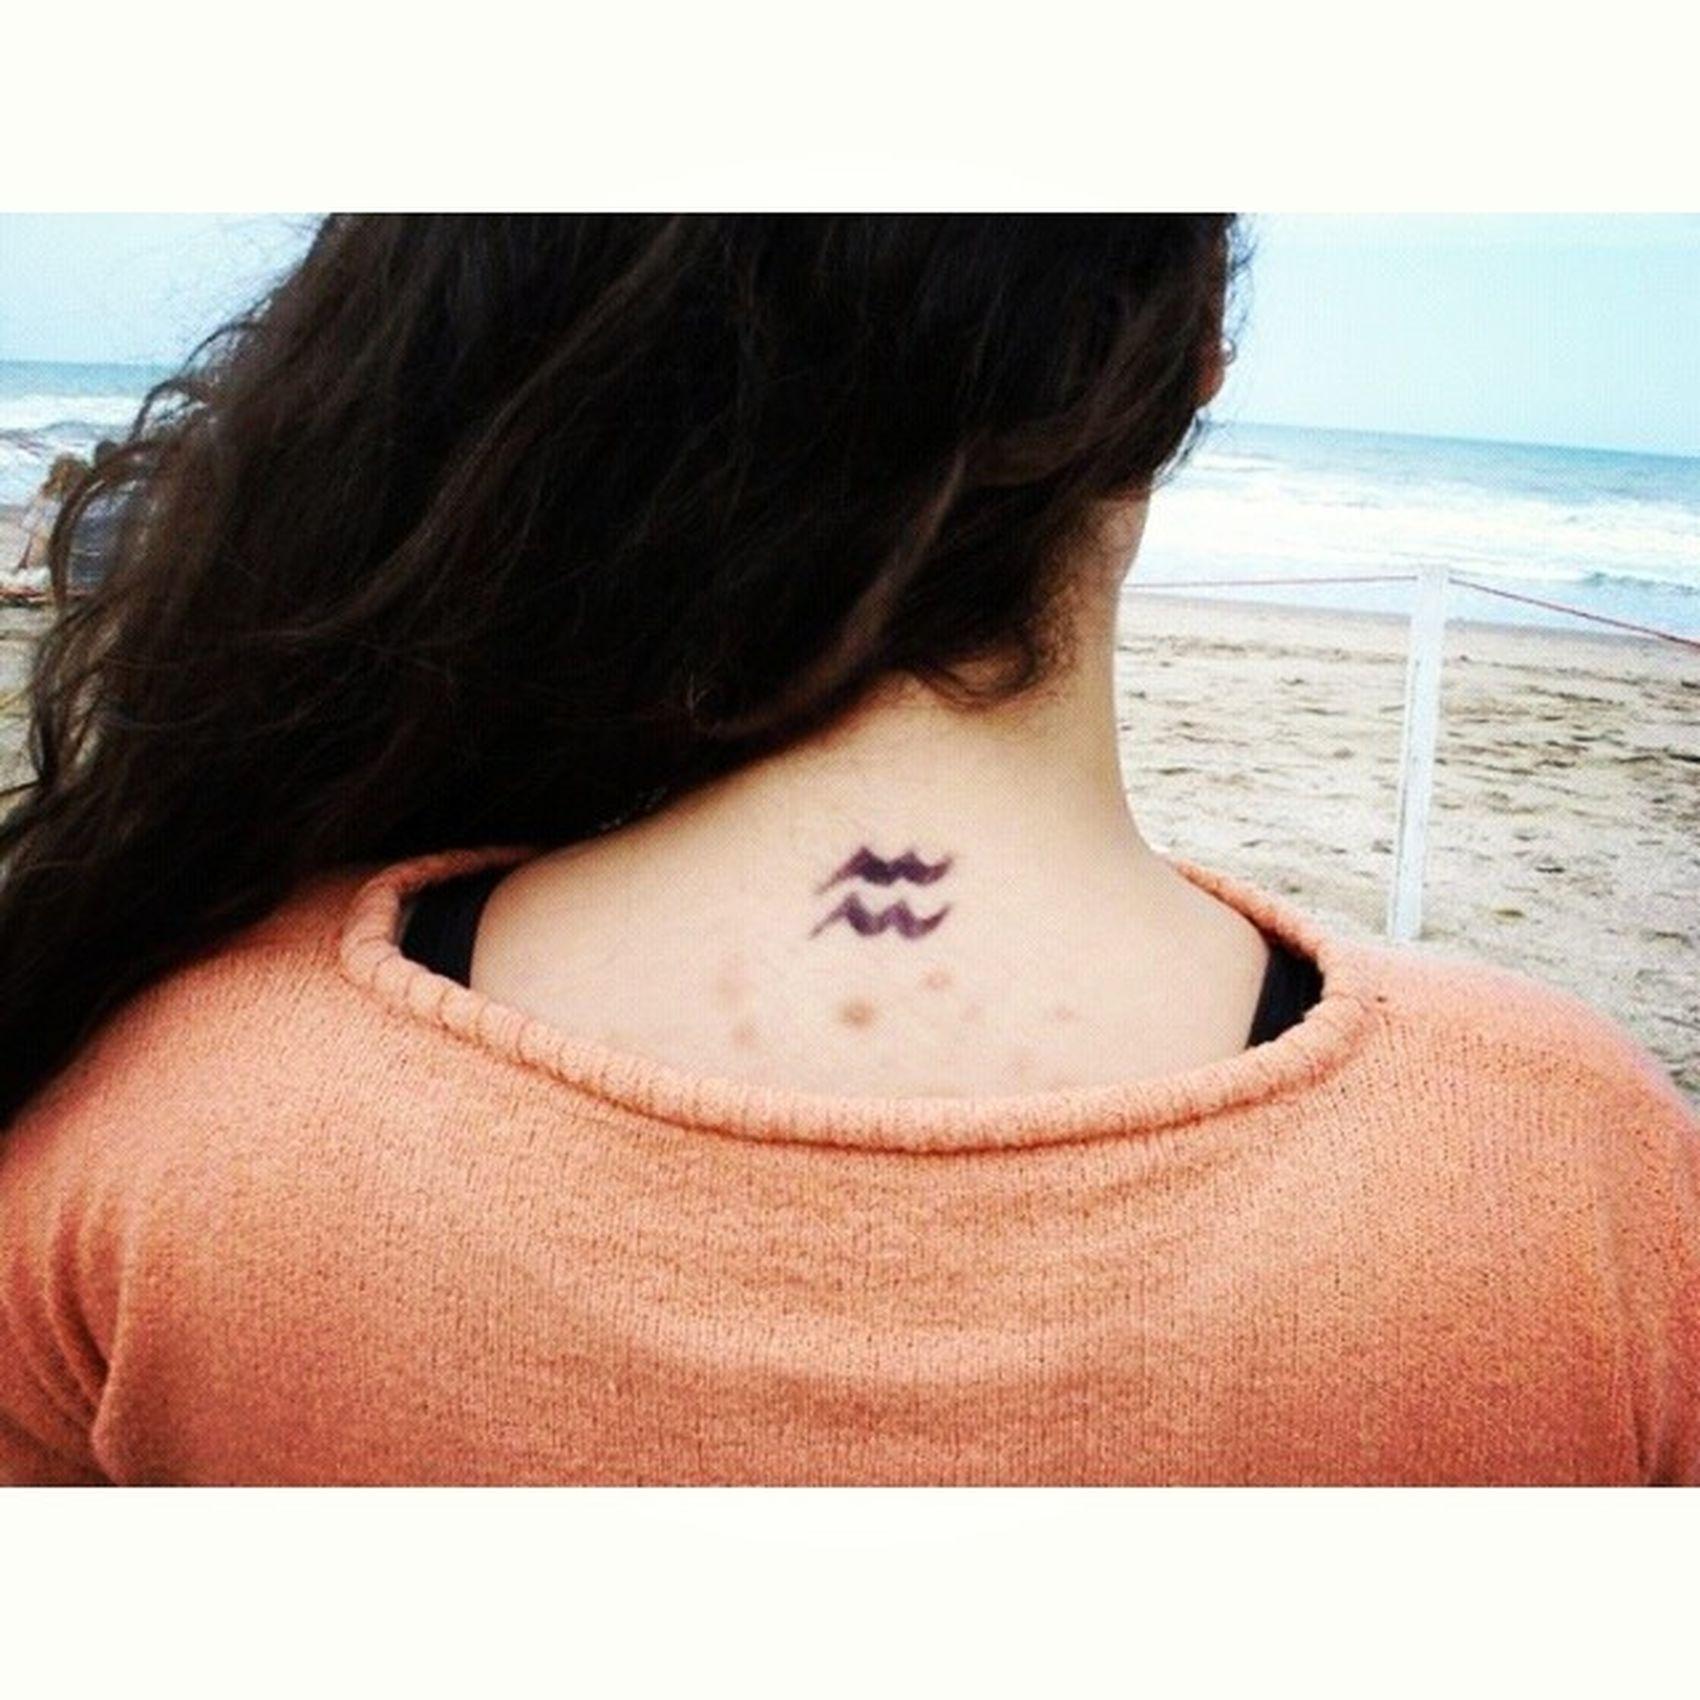 Tattoo Aquarius Perfect AquaGirl Passion WishItWasReal IFuckingLoveAquarius Zodiac AirSign HateHashtags hahaIronic Bye